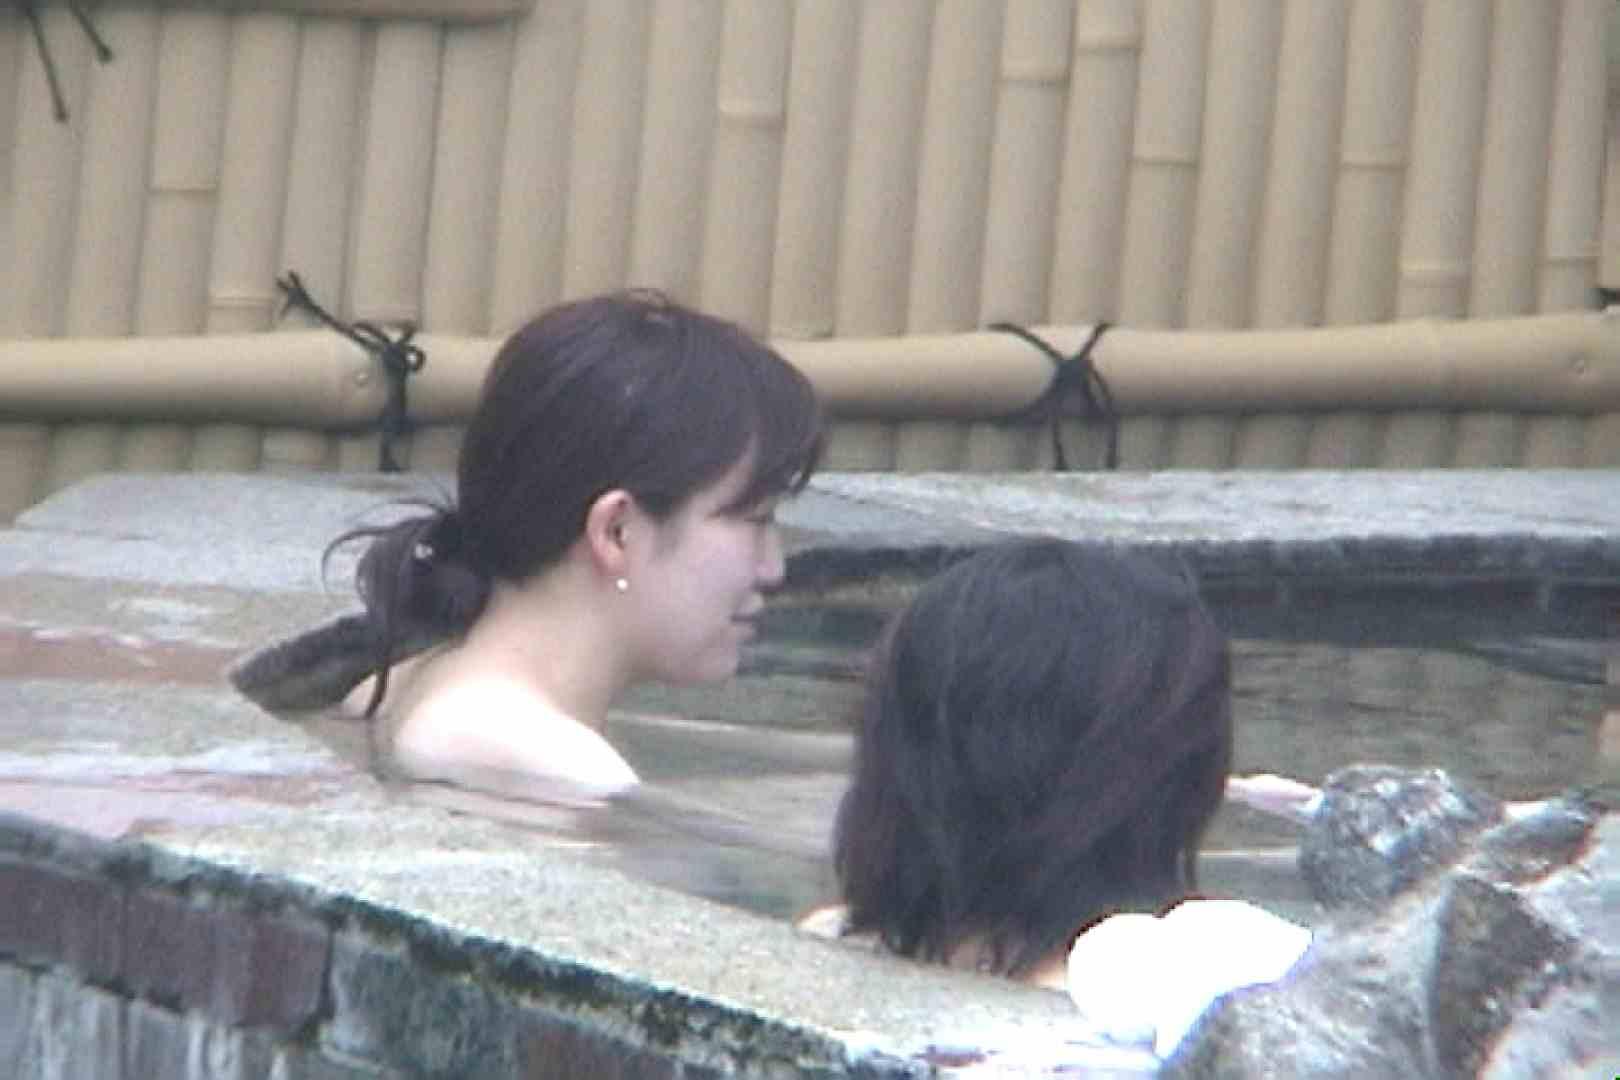 Aquaな露天風呂Vol.79【VIP限定】 盗撮 | HなOL  100pic 99